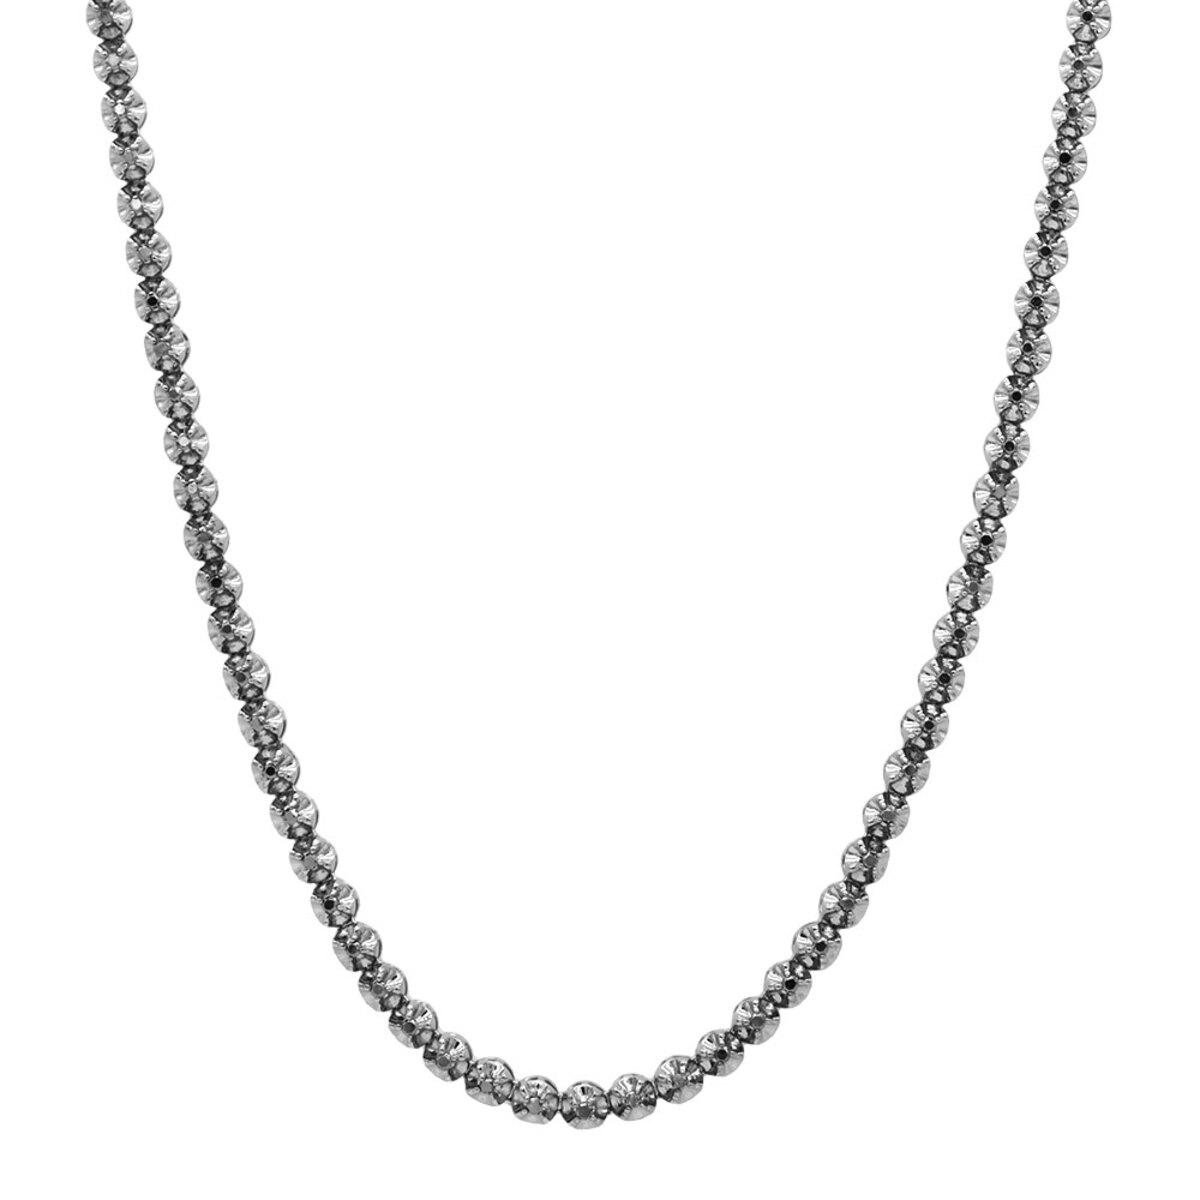 Black Diamond Jewelry 10K Eternity Diamond Necklace 9ct